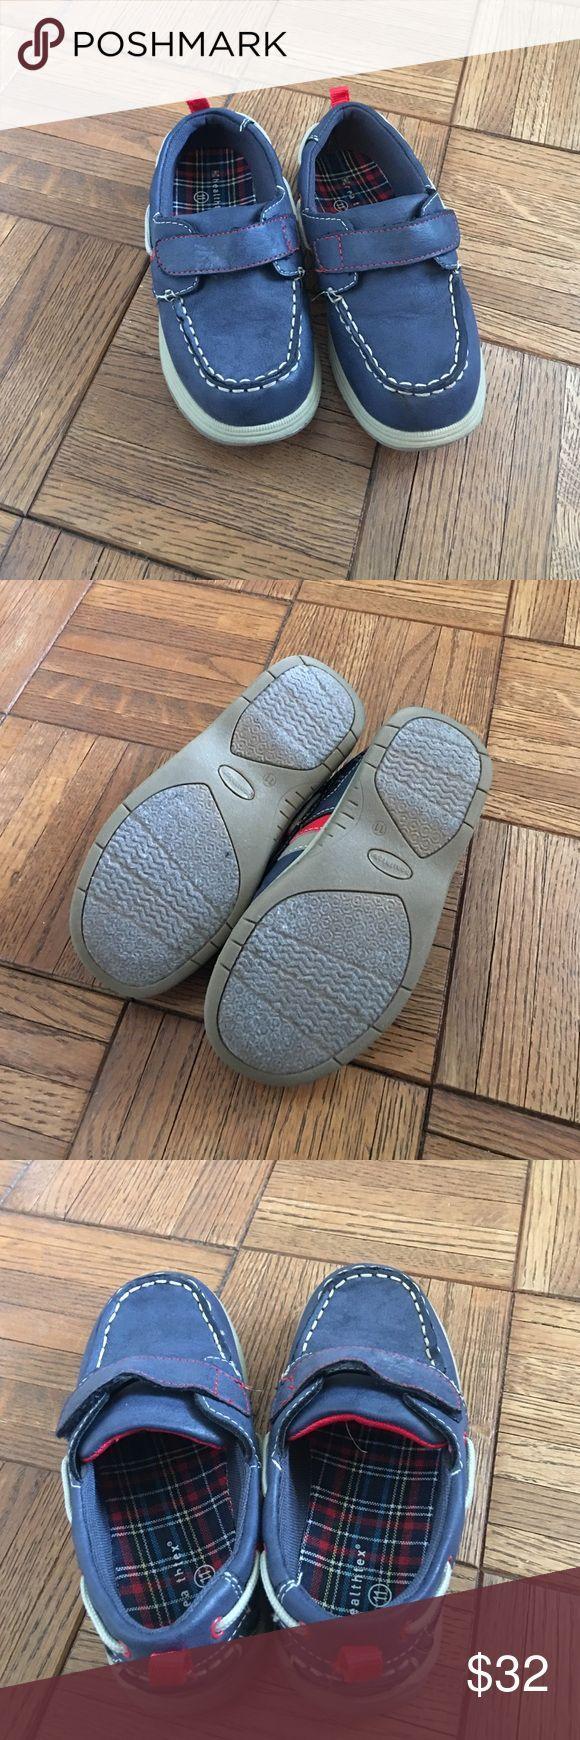 Like new boys blue boat shoe. Size US 11 Blue boys boat shoe with Velcro closure. Like new with very minimal signs of wear on bottom of soul. Boys US size 11 Shoes